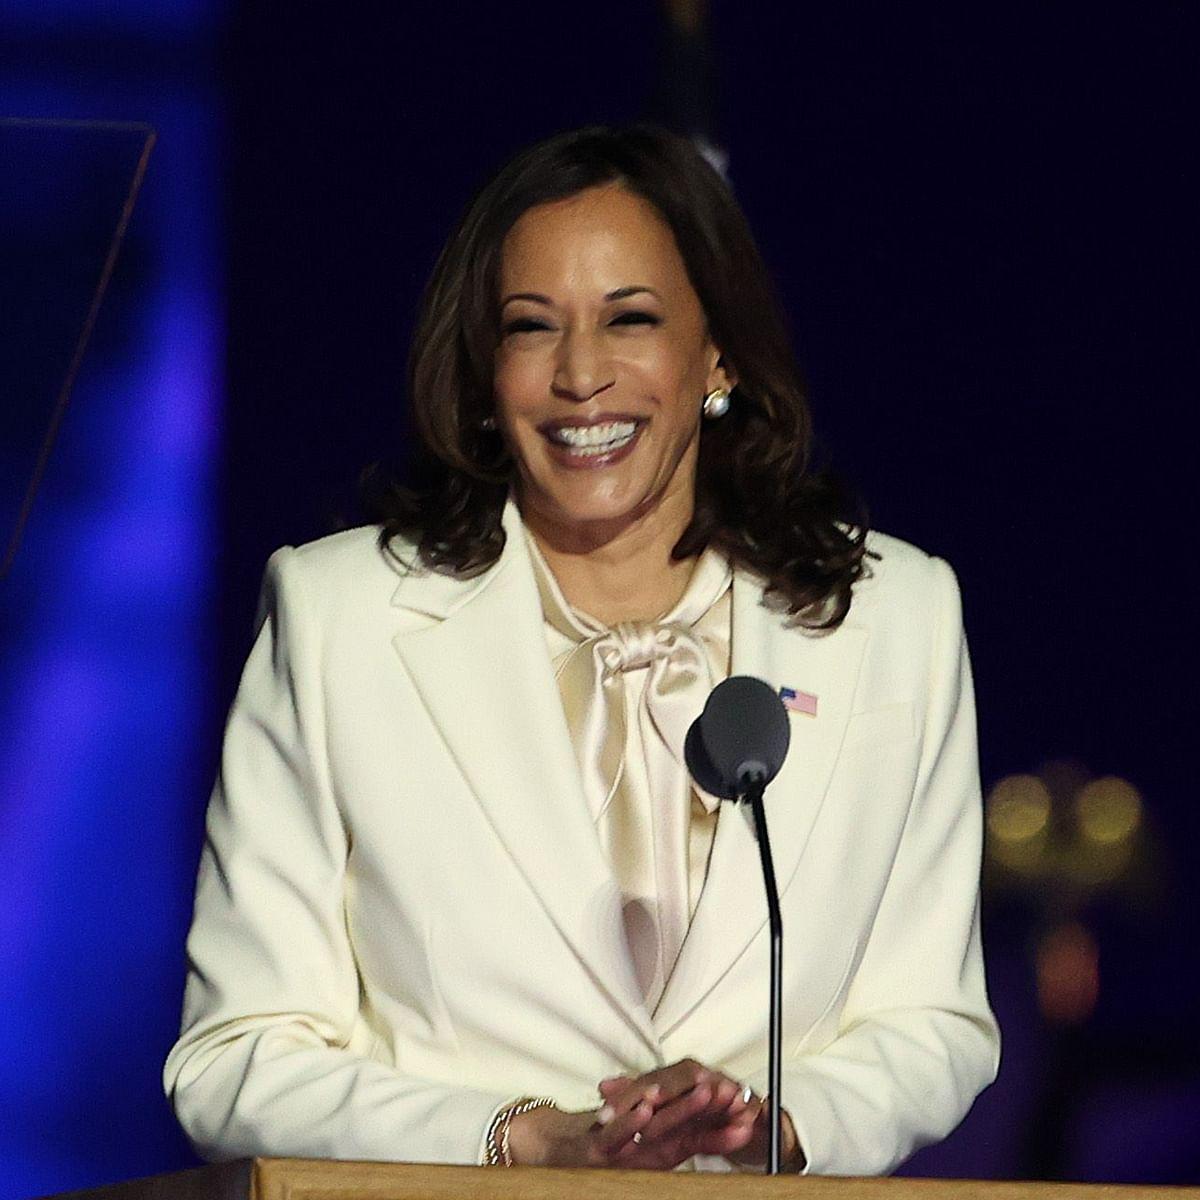 Our White House journey won't be easy: Kamala Harris